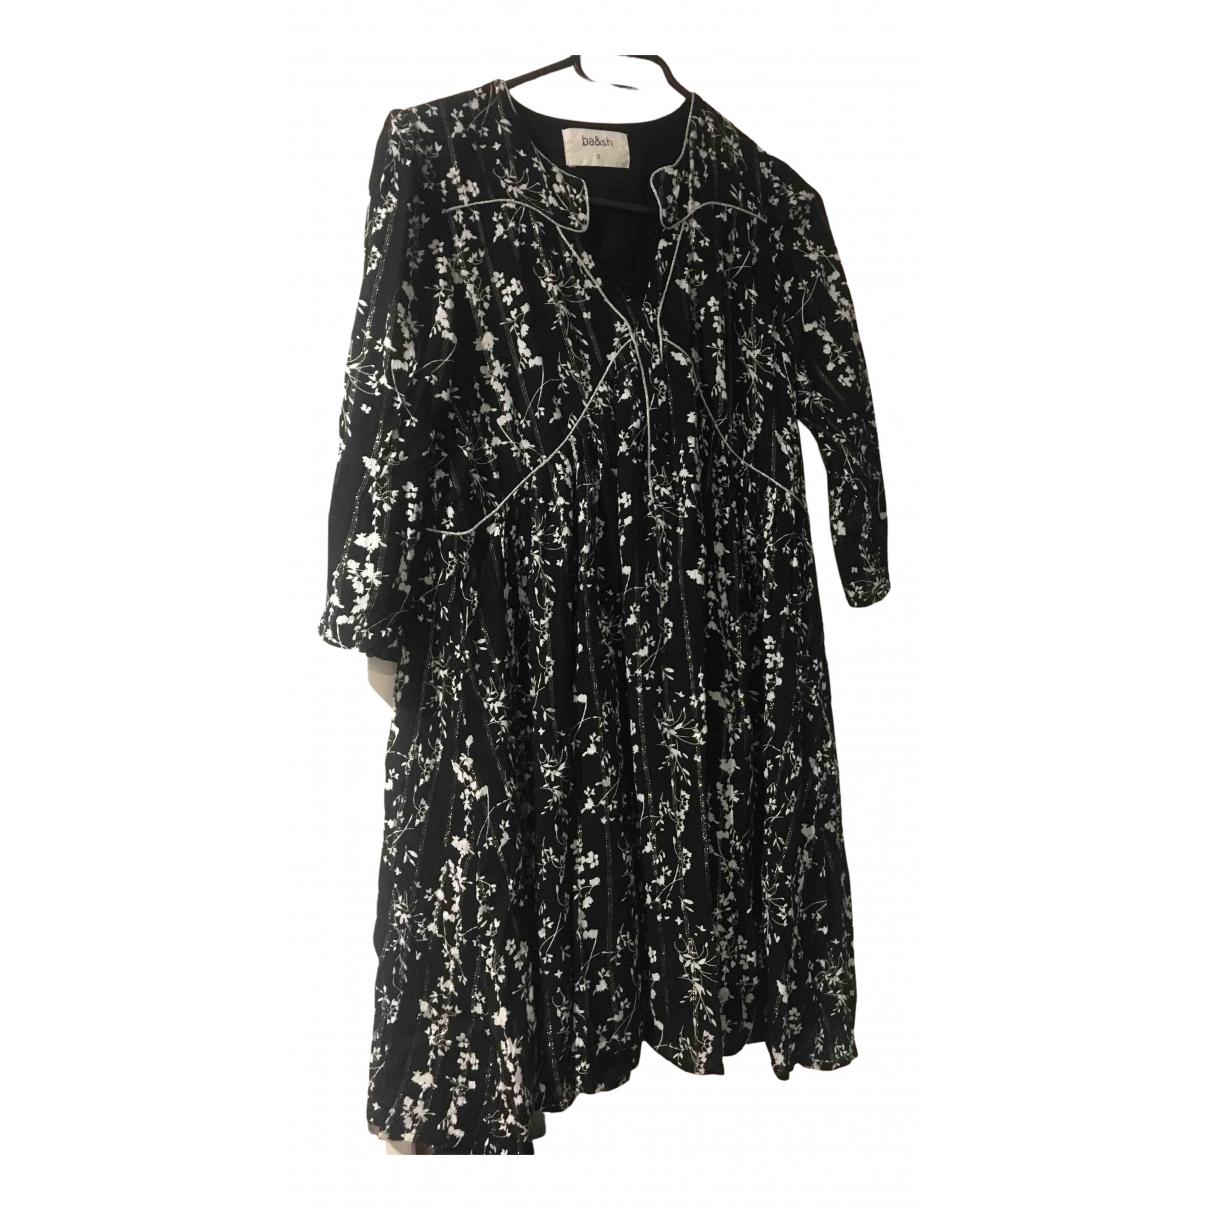 Ba&sh N Black dress for Women 0 0-5